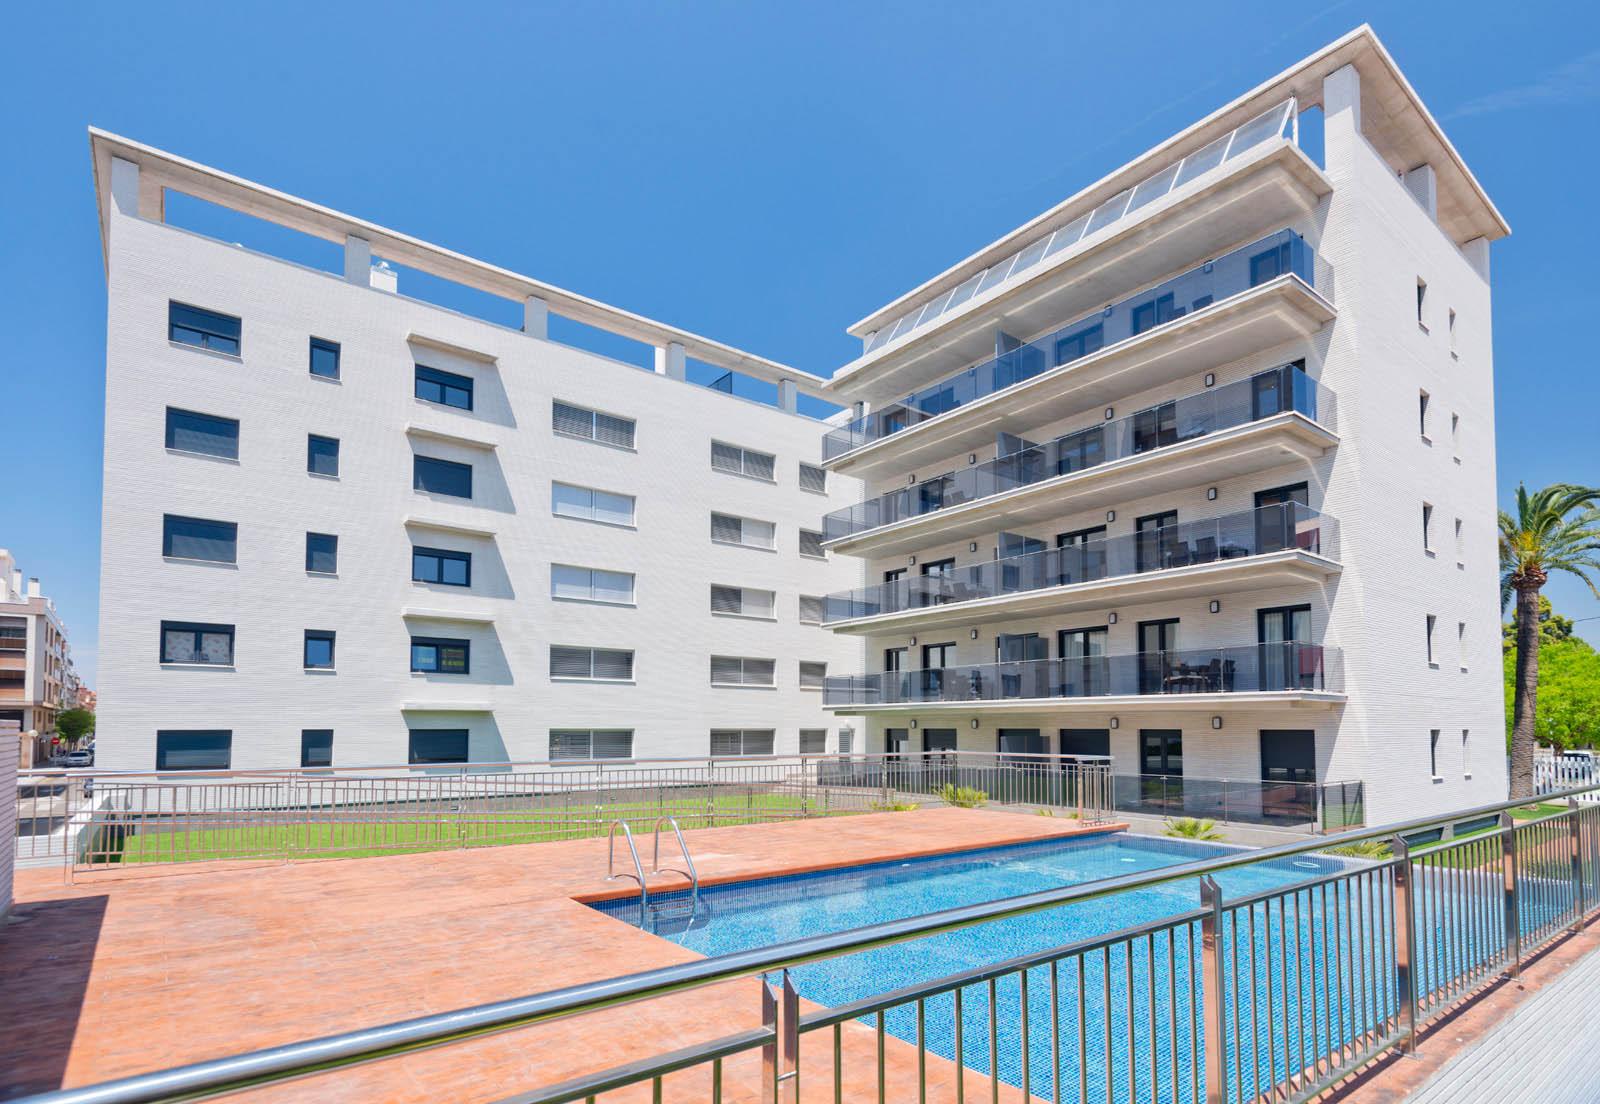 Fotos apartamentos las palmas viii salou tarragona espa a - Apartamentos puerto rico las palmas ...